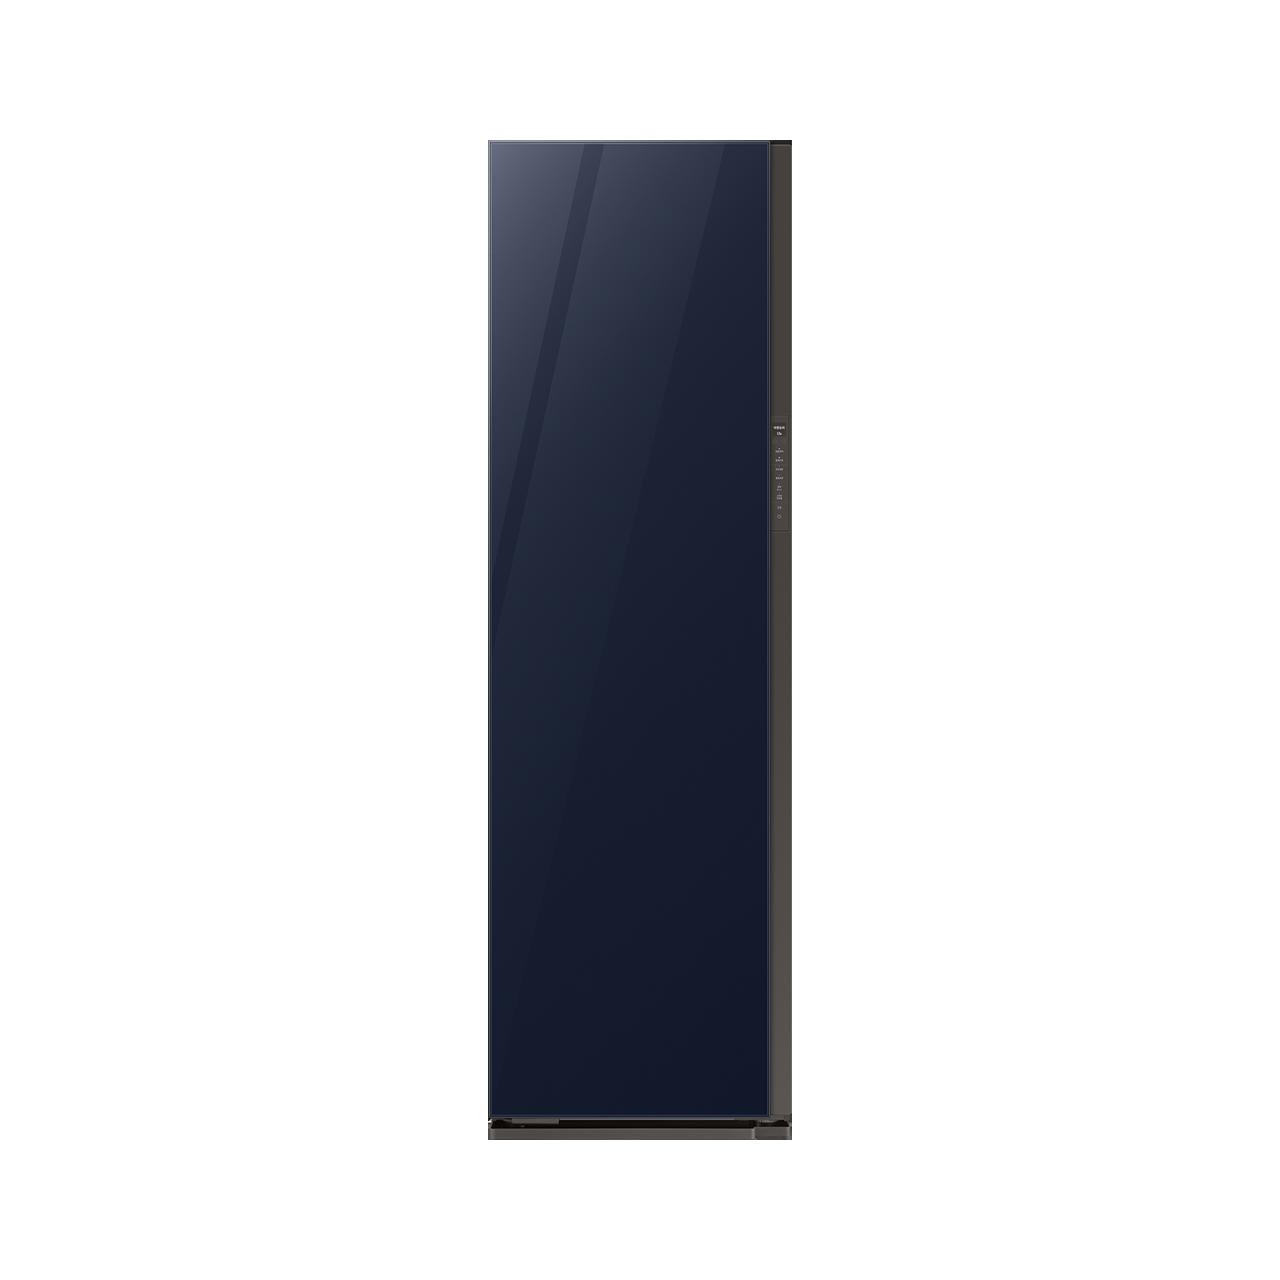 [Special+] 삼성 BESPOKE 에어드레서(5벌) SECDF10A95V0